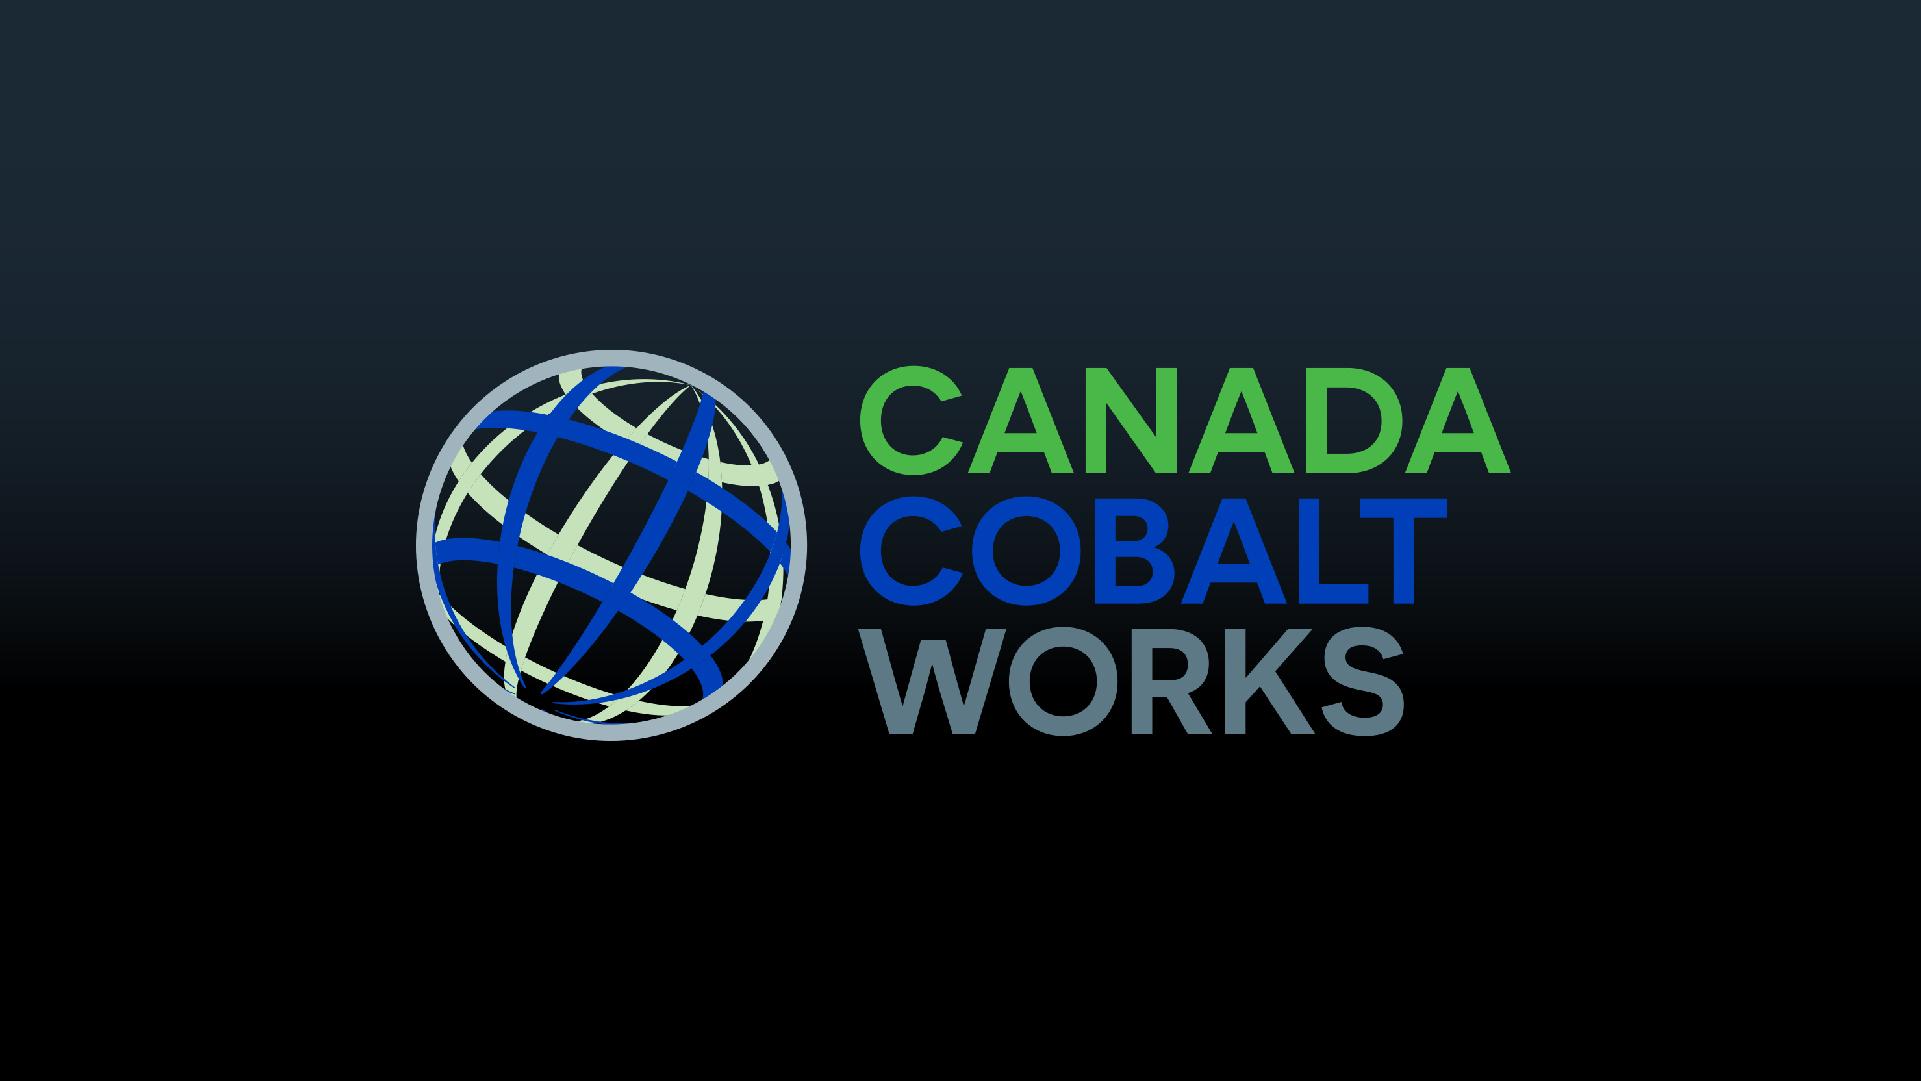 Canada Cobalt Works Inc  (TSXV: CCW) - 2019 TSX Venture 50